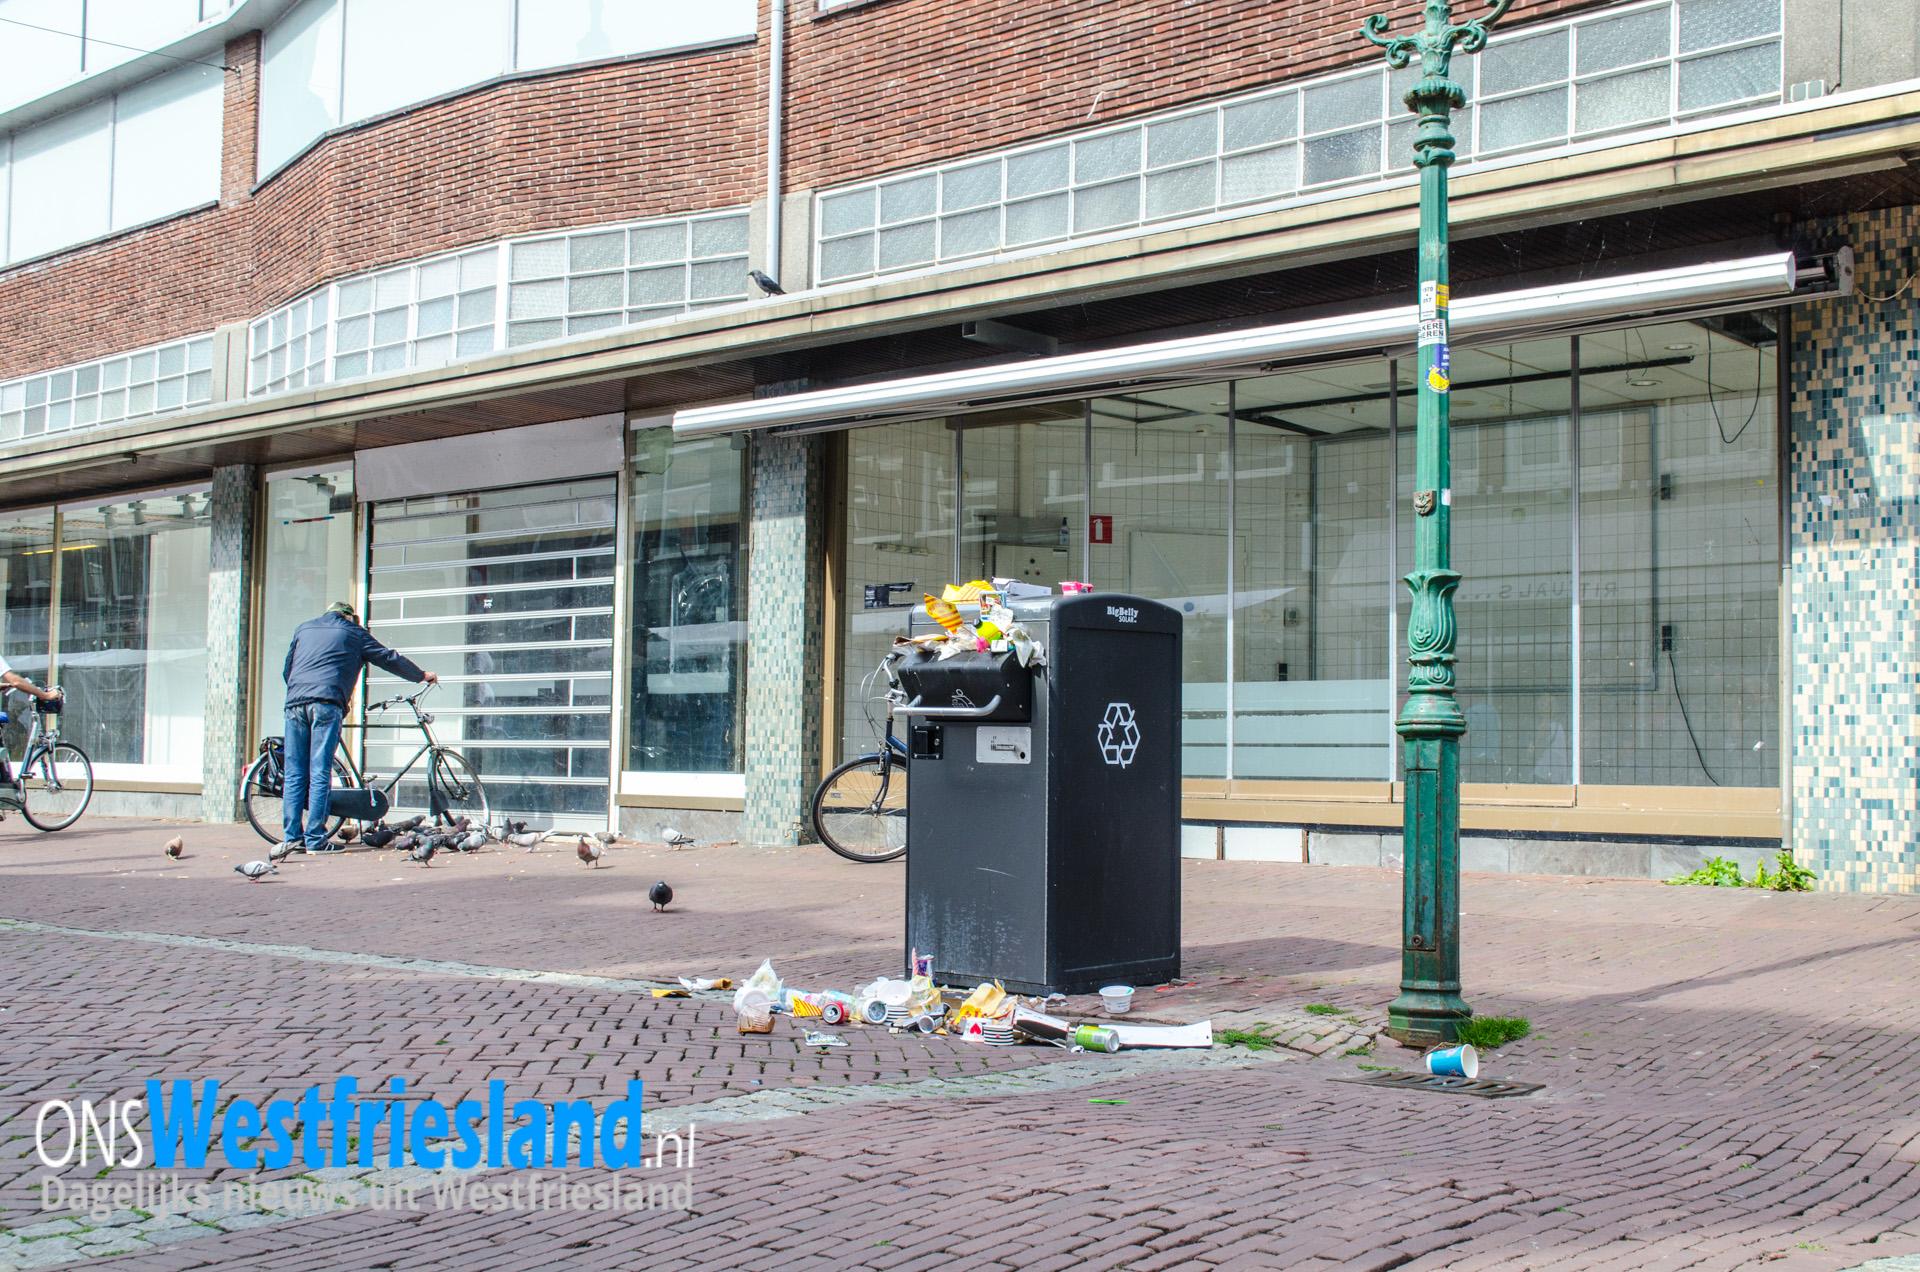 Alarm in V&D panden Hoorn ruim 15 uur luid hoorbaar [video]